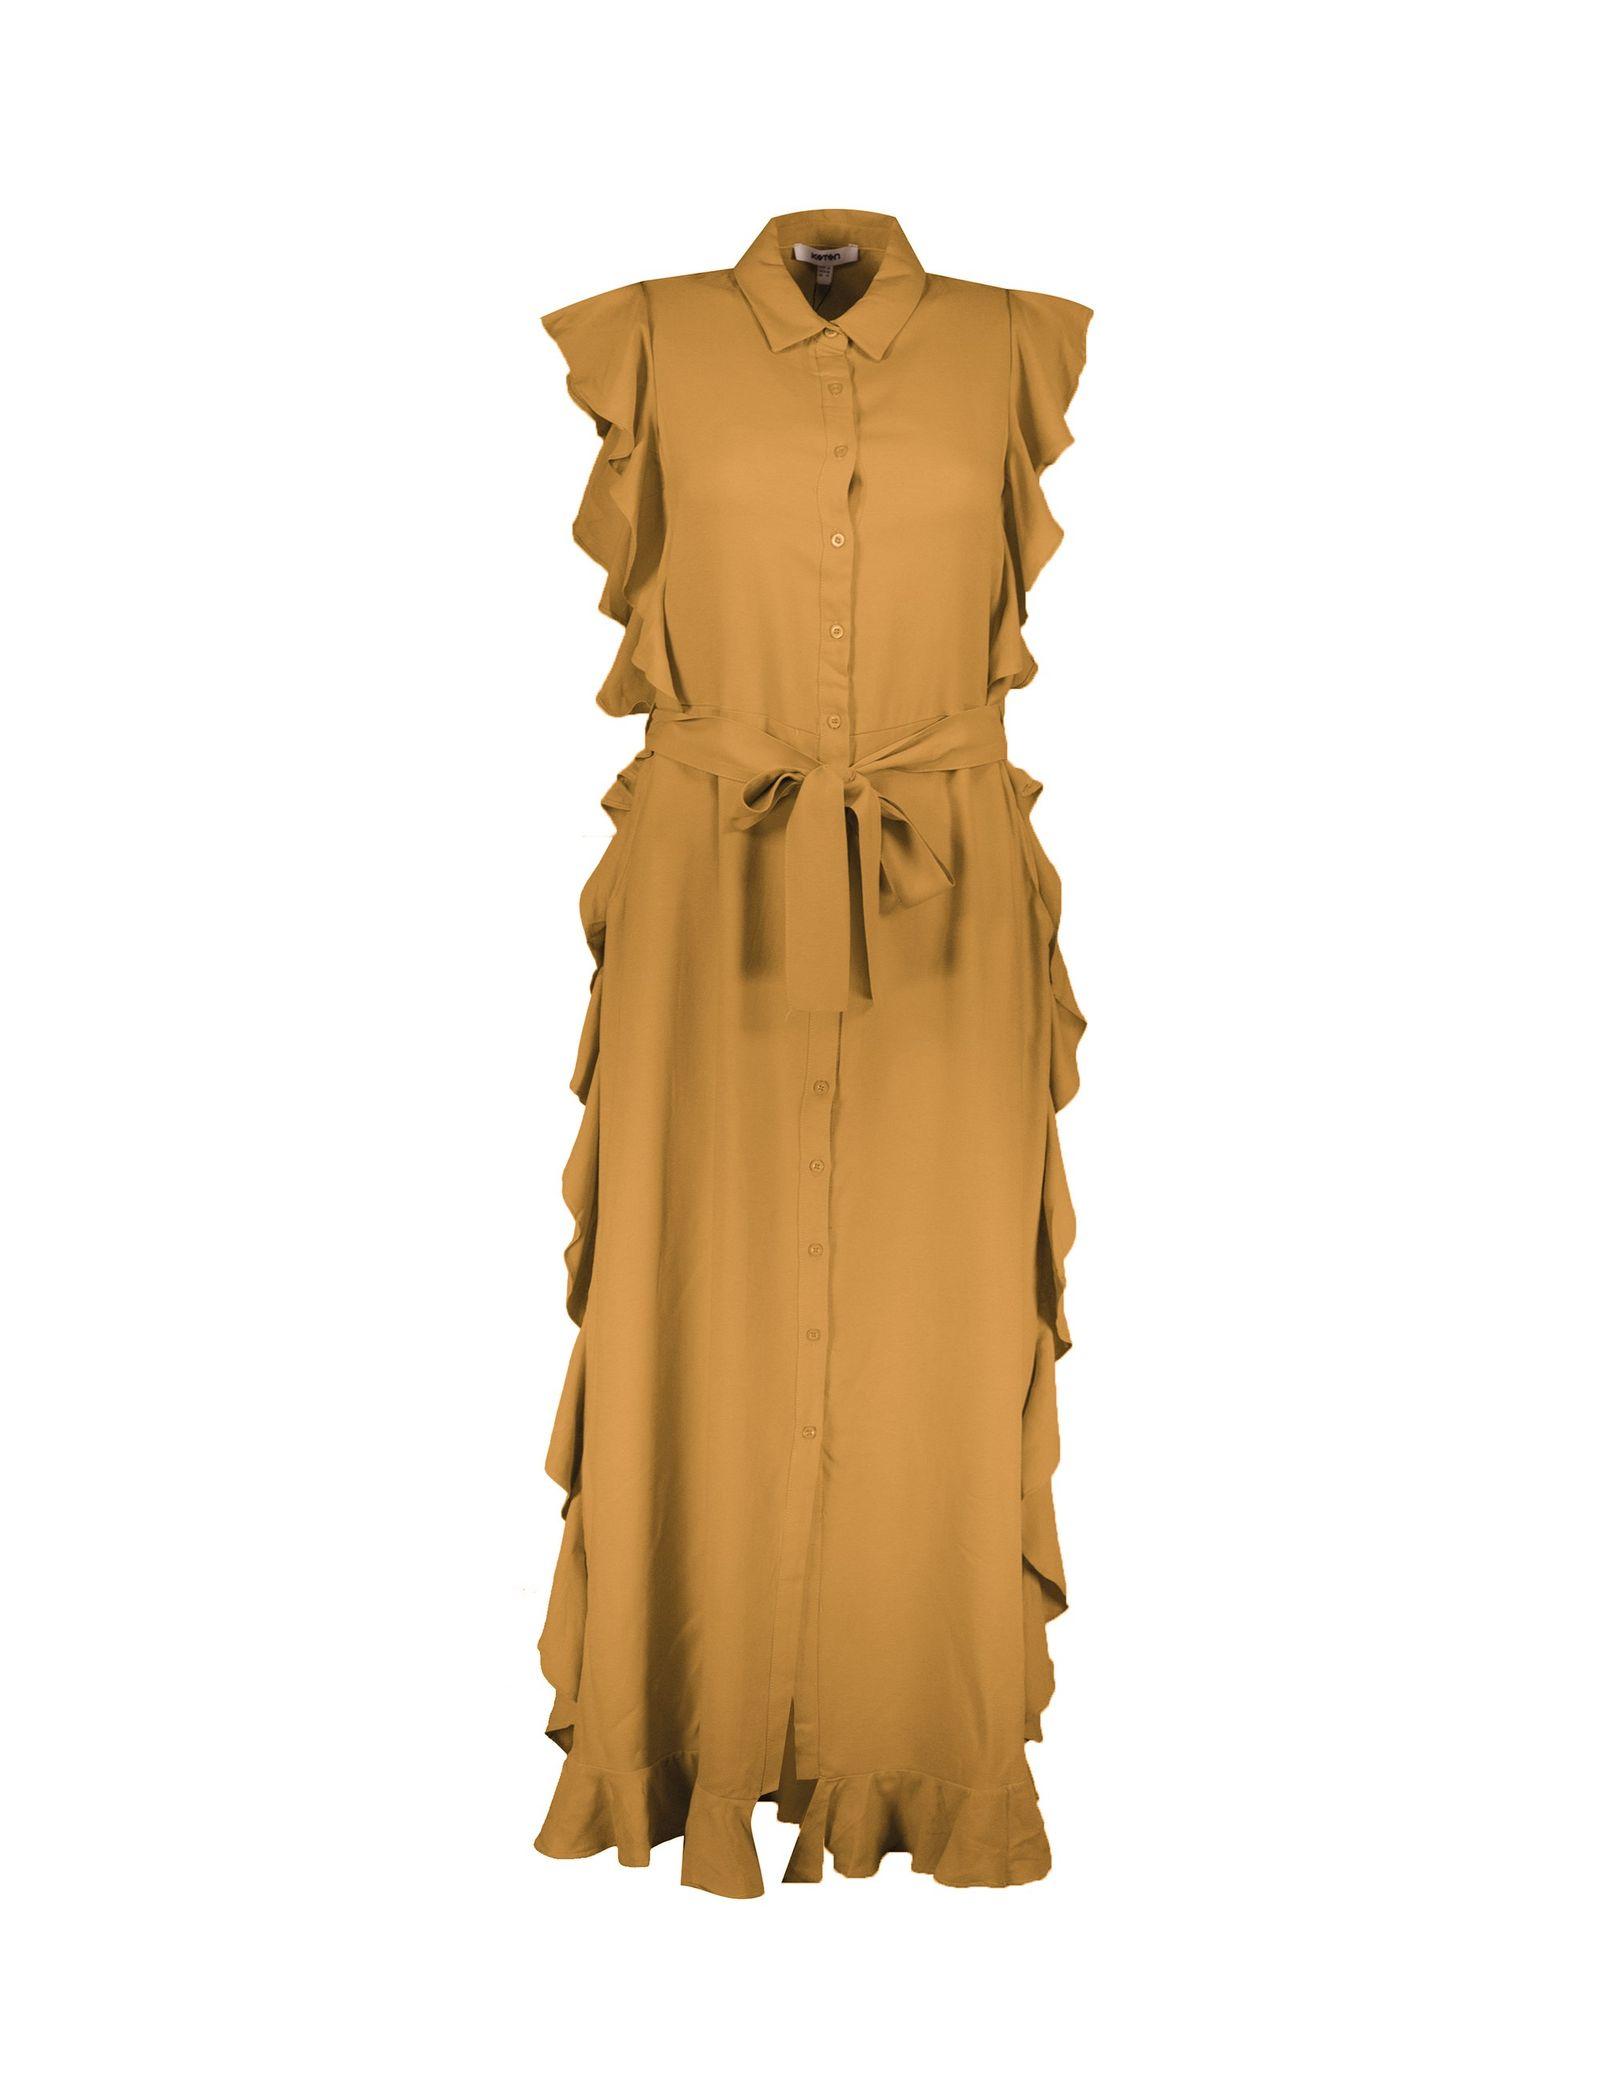 پیراهن ویسکوز بلند زنانه - کوتون - نارنجي - 1